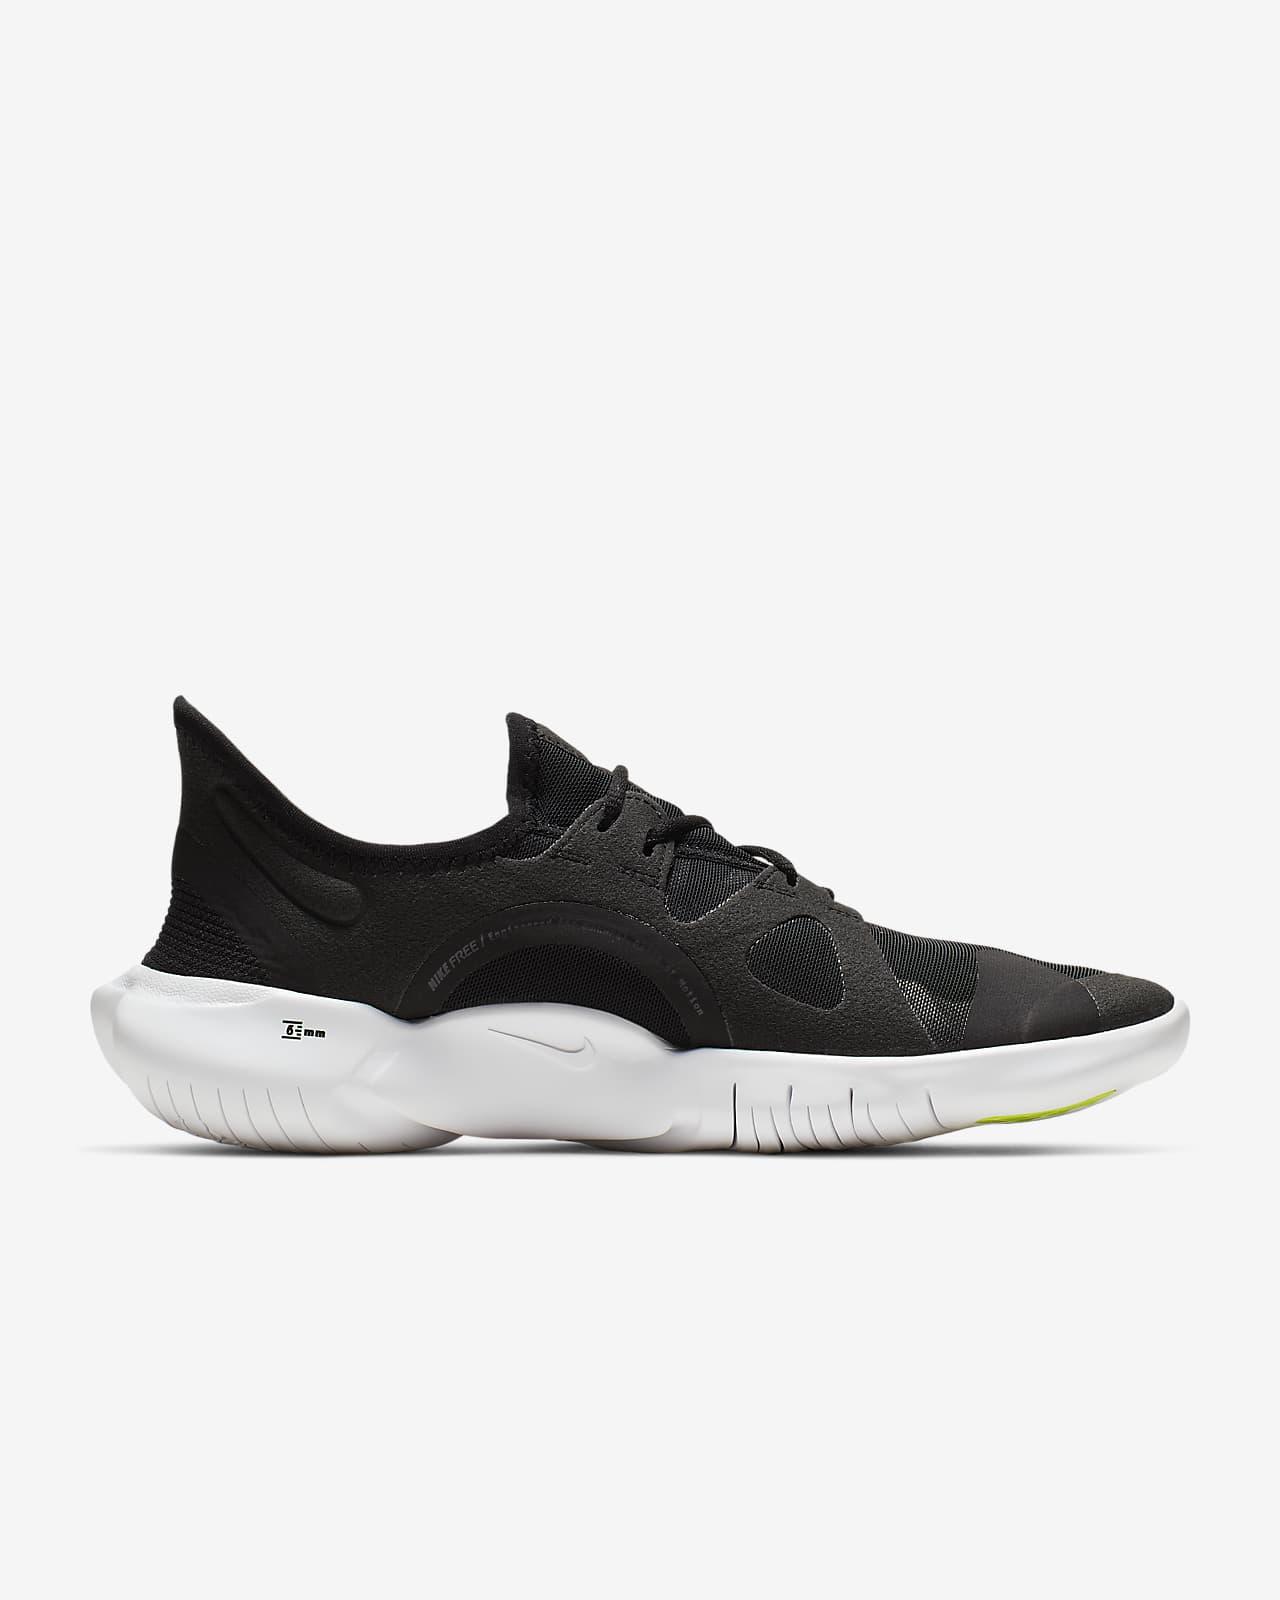 Nike Free RN 5.0 Women's Running Shoe